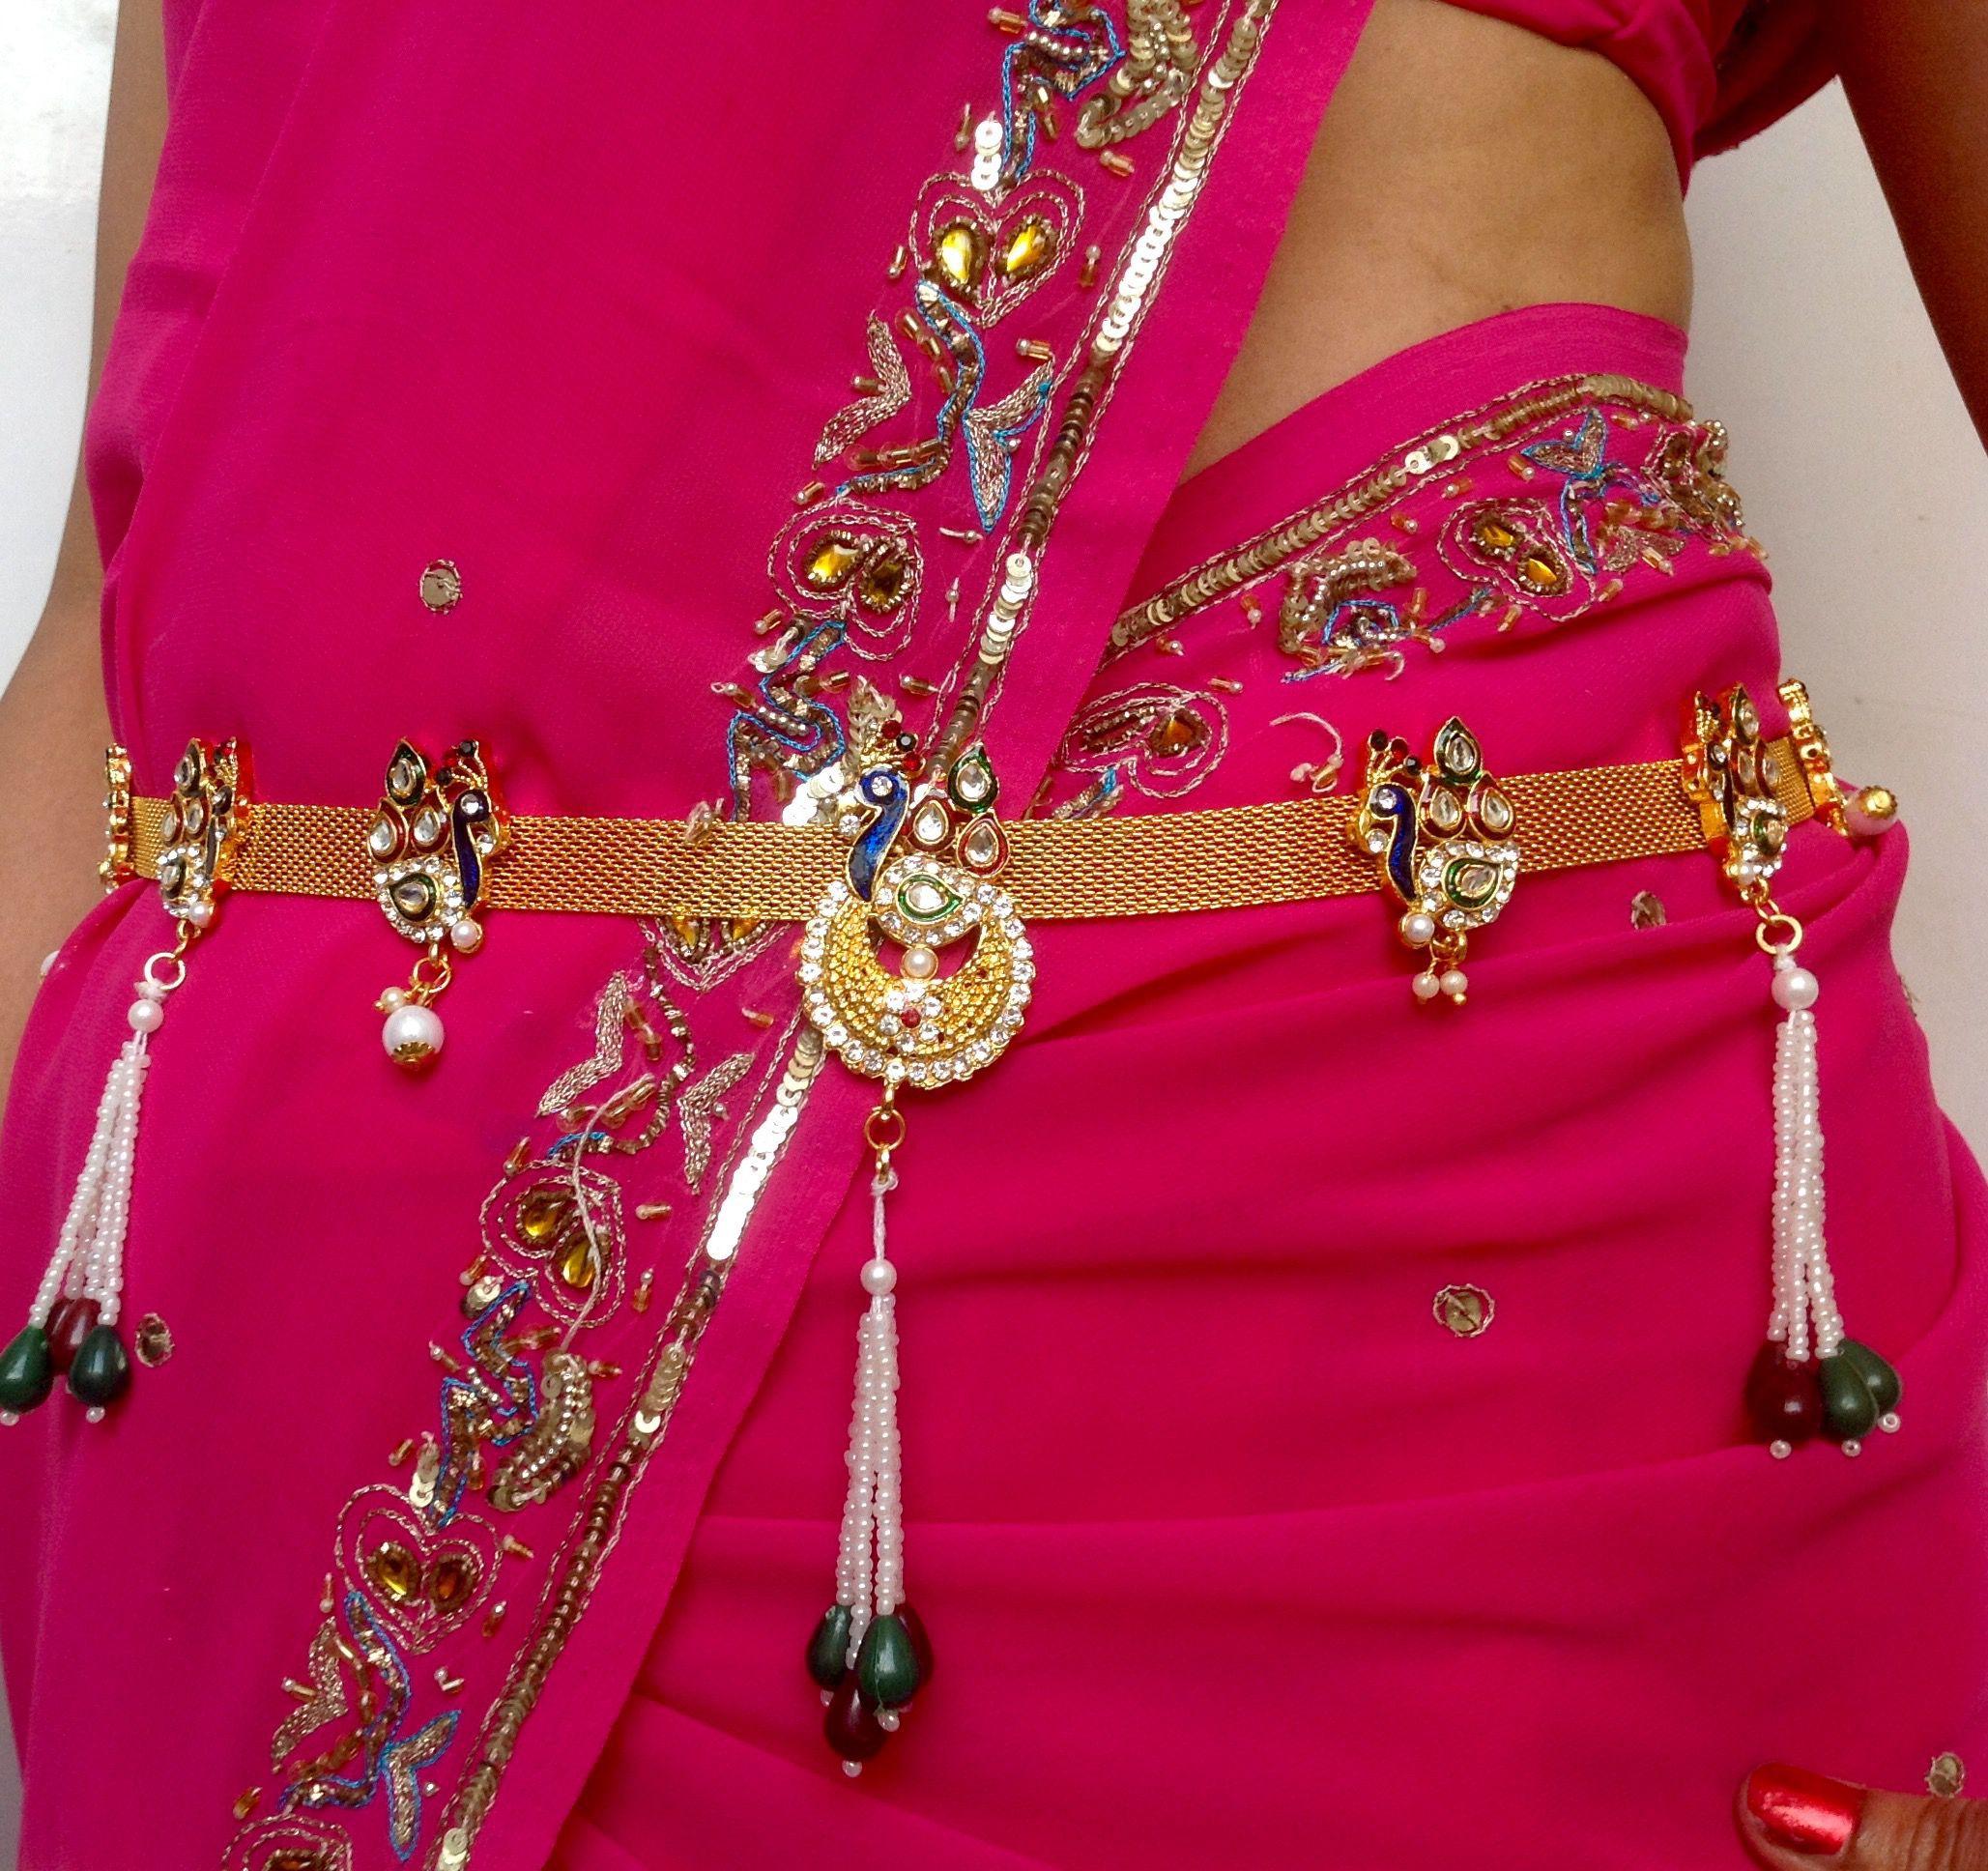 682f50955c3f9 Beautiful peacock design Traditional gold polished kamarpatta, Kamar chain,  tagdi, Kardhani, bellychain, waist chain, hip chain, Kamarband, gold ...